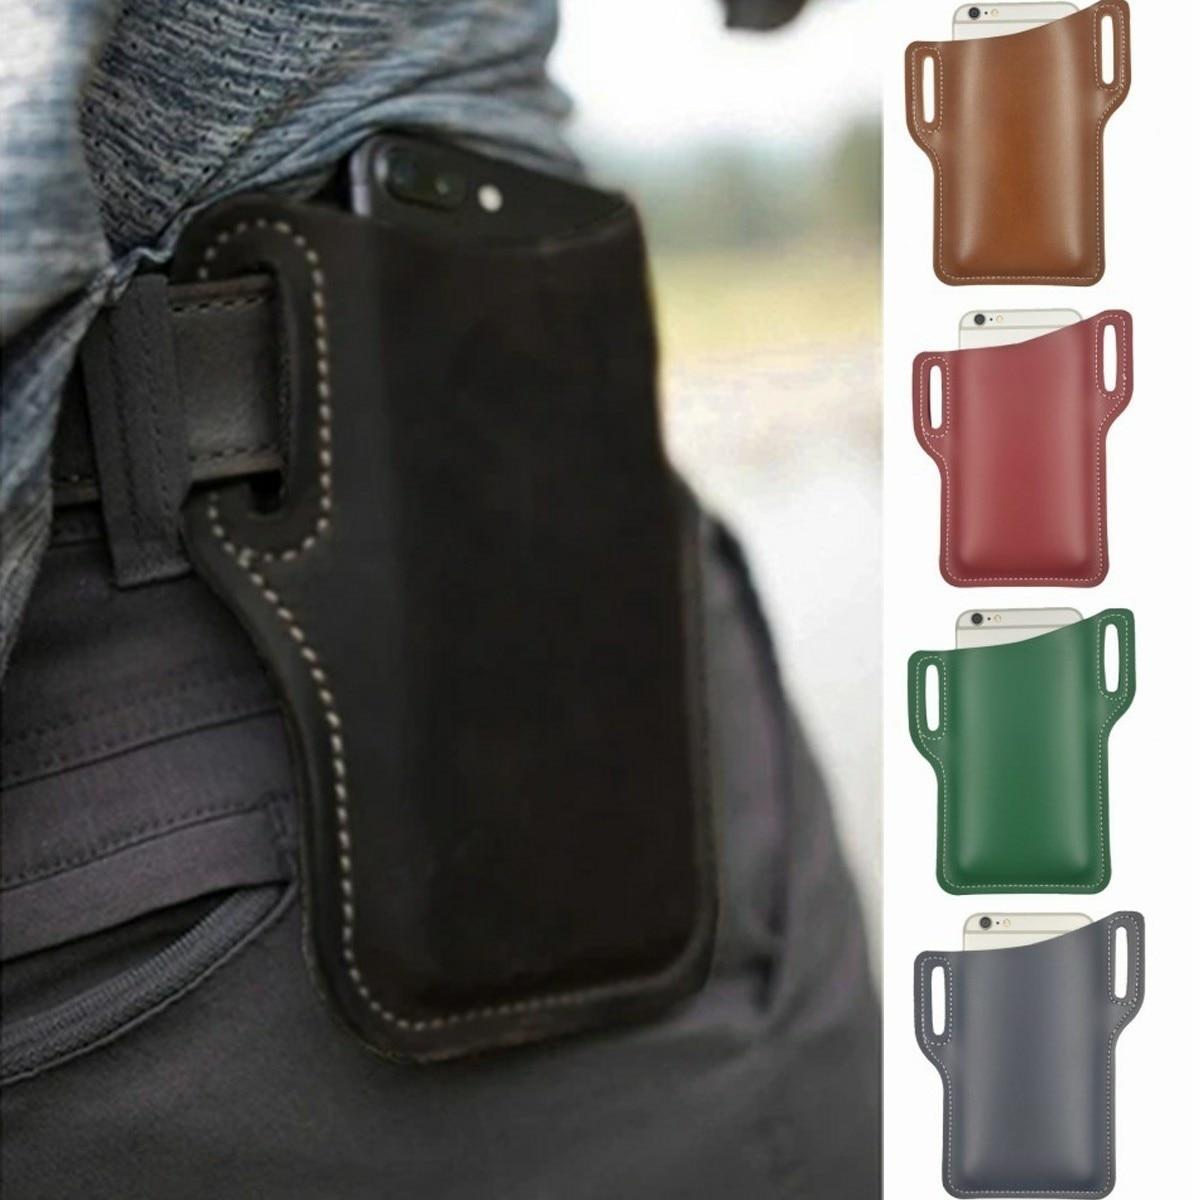 AliExpress - 7 Colors Unisex Cellphone Leather Holster Belt Loop Case Belt Waist Phone Bag Men Women Cosplay Props Leather Purse Phone Wallet